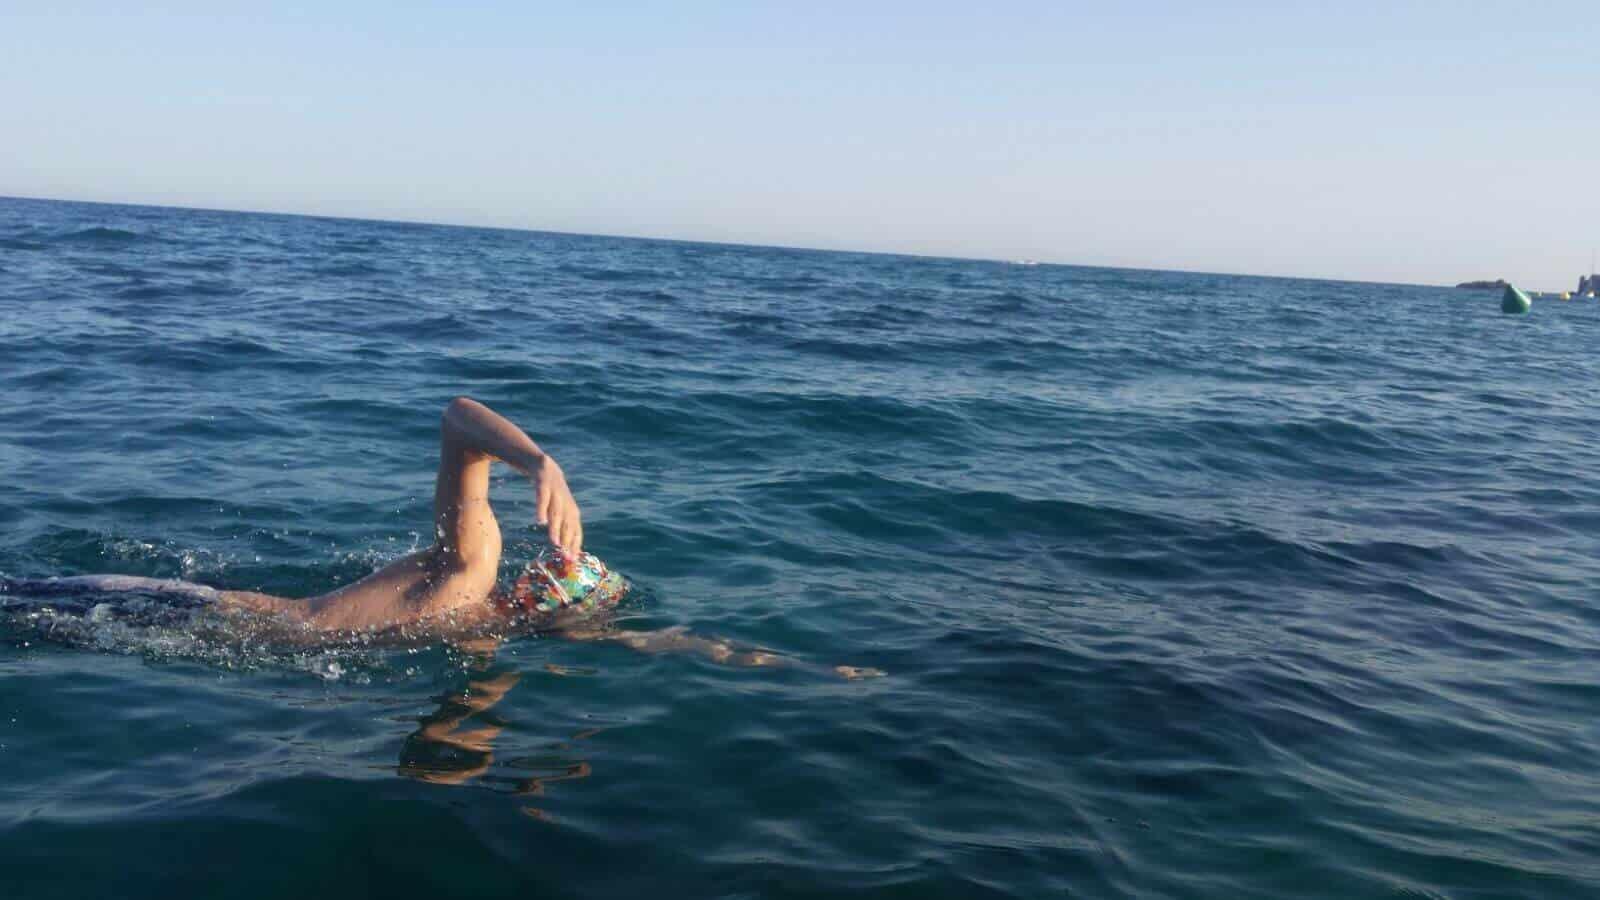 Claves para aprender a nadar